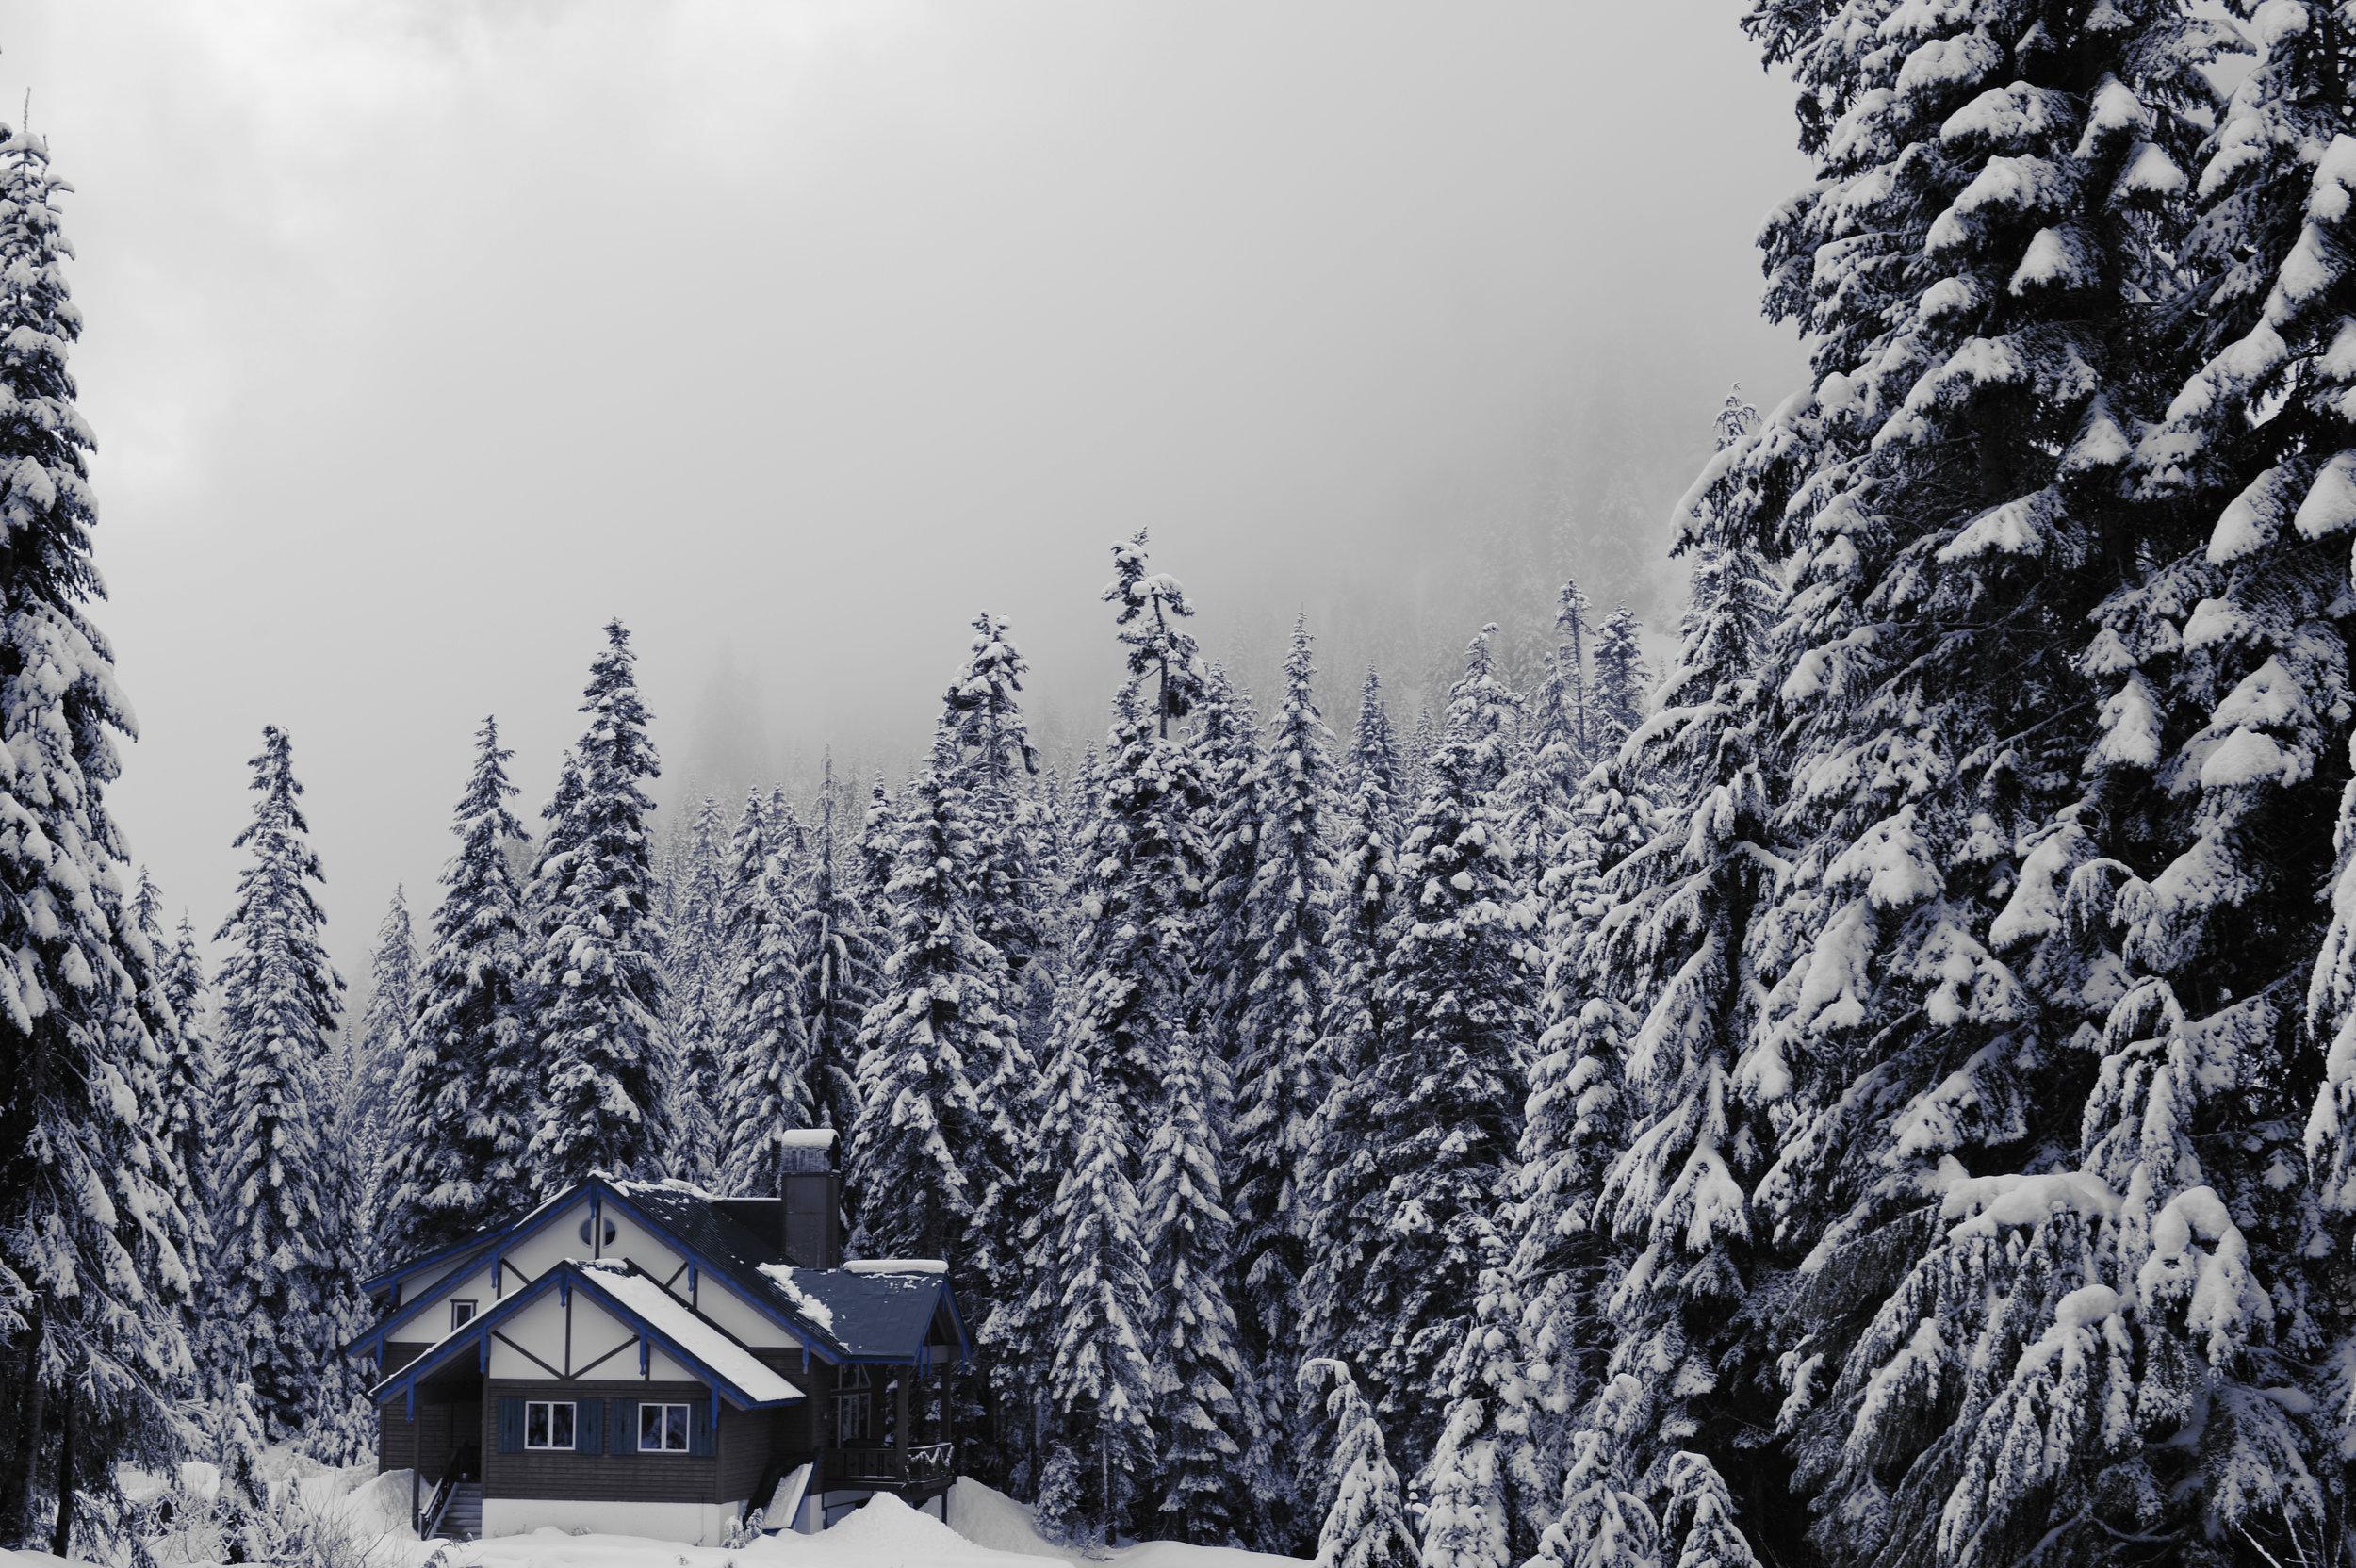 snow-lodge.jpg